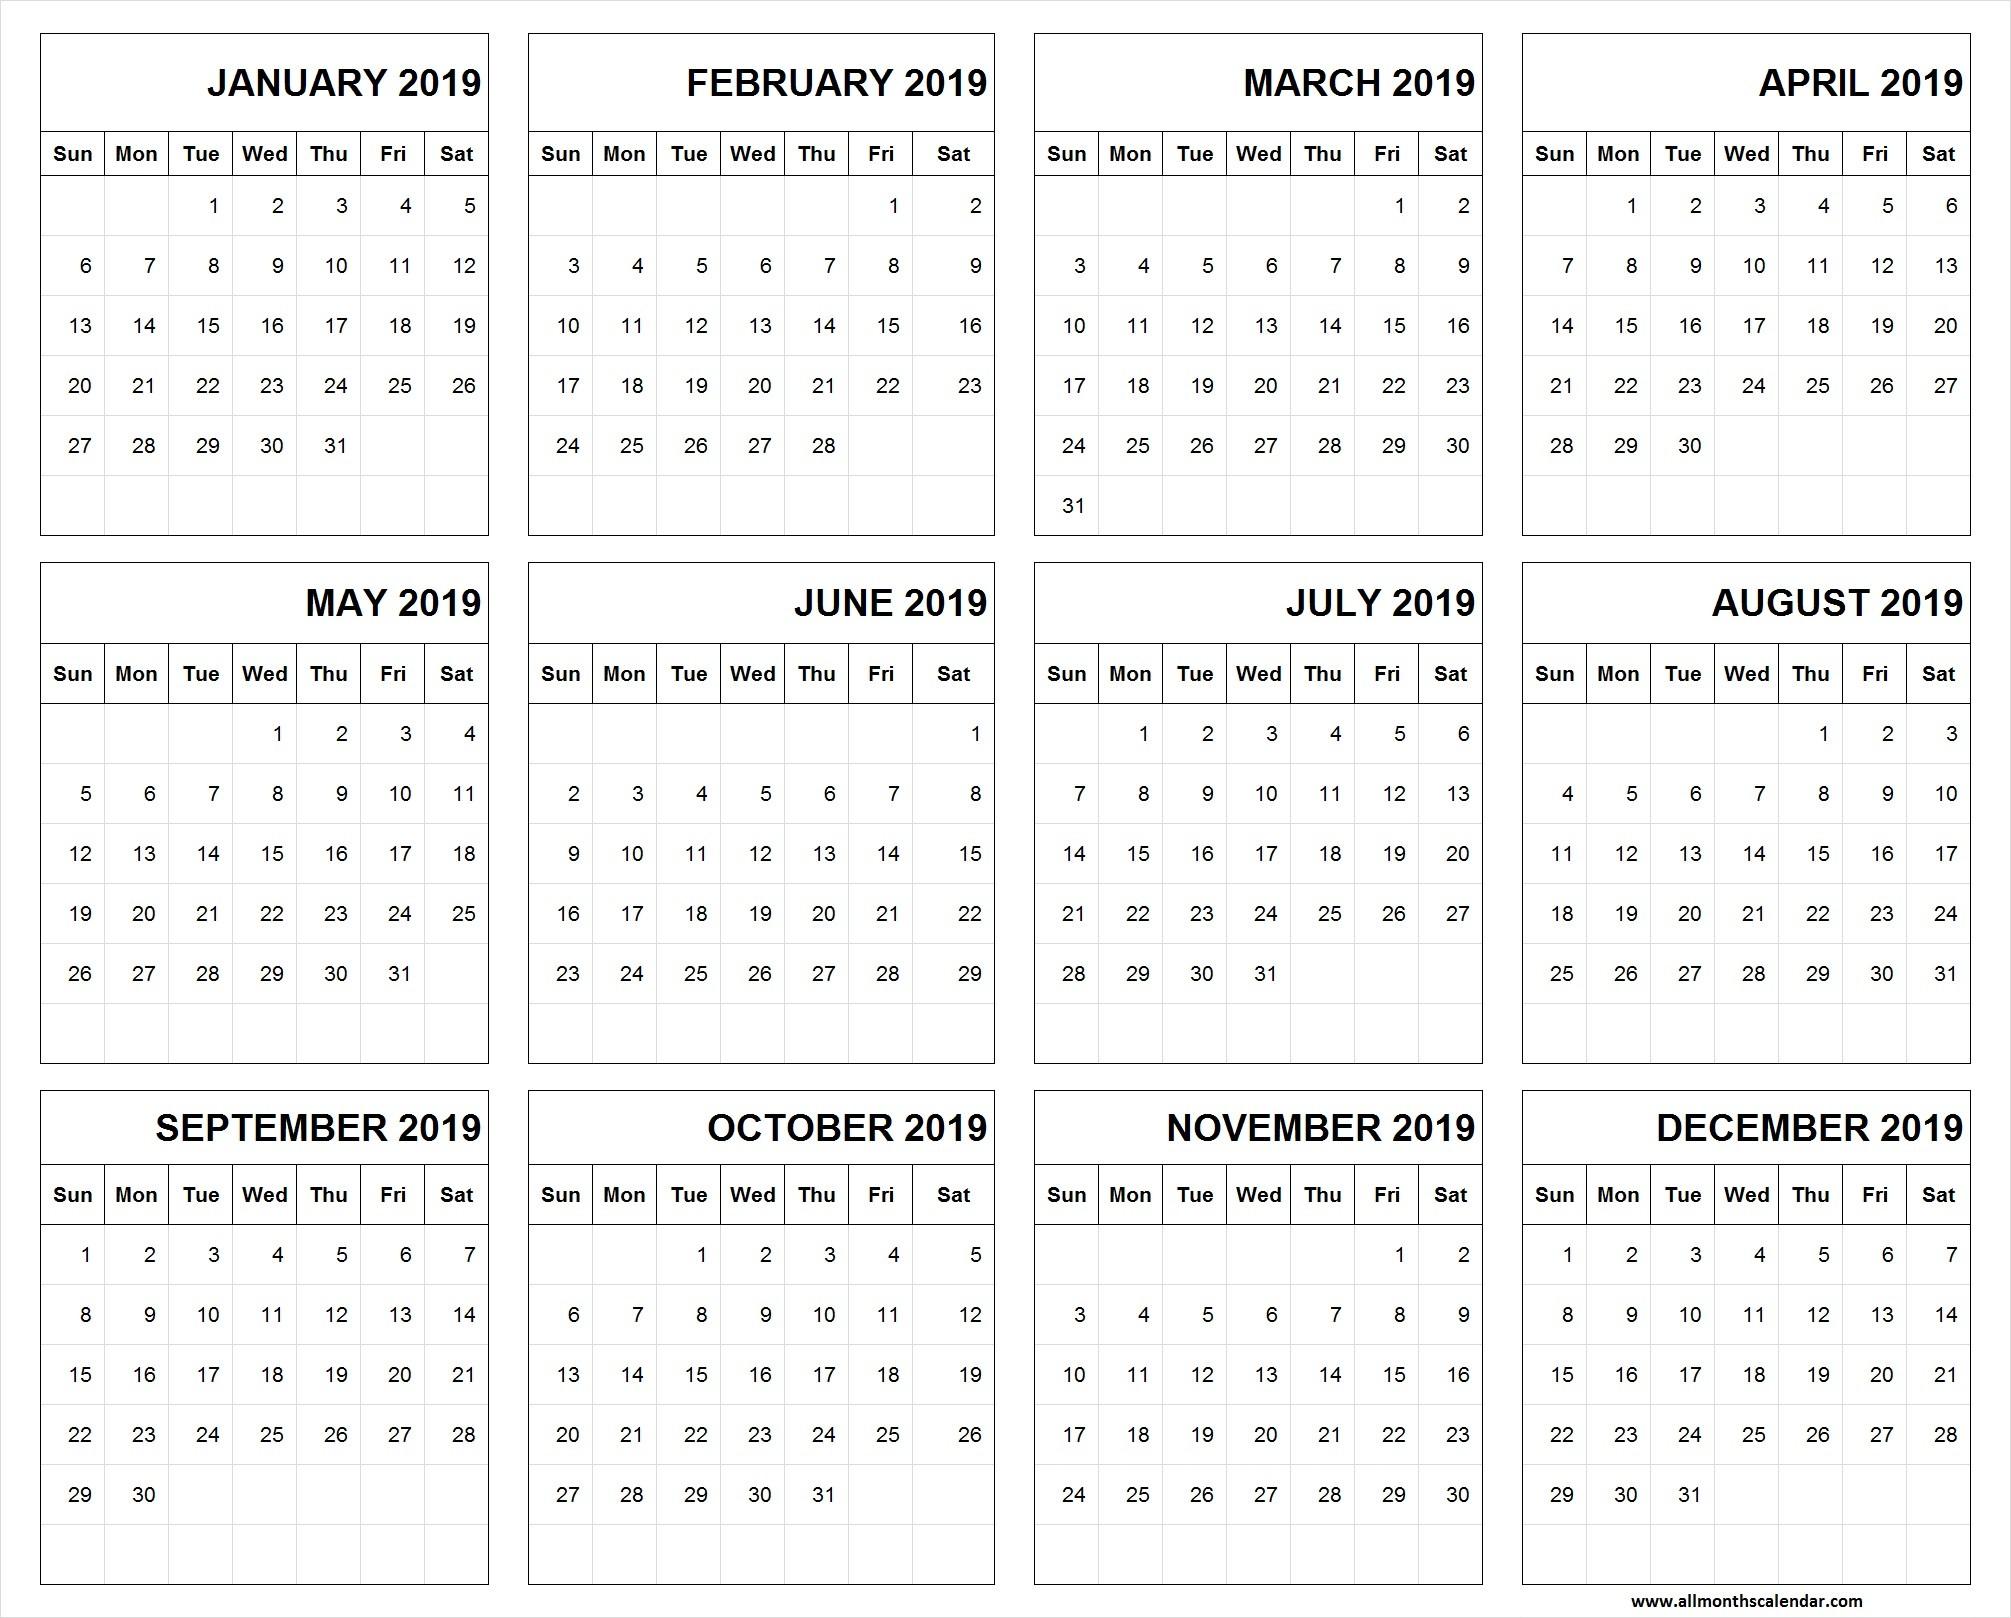 Printable Calendar for 2019 and 2019 Printable Calendar January 2019 to December 2019 Template